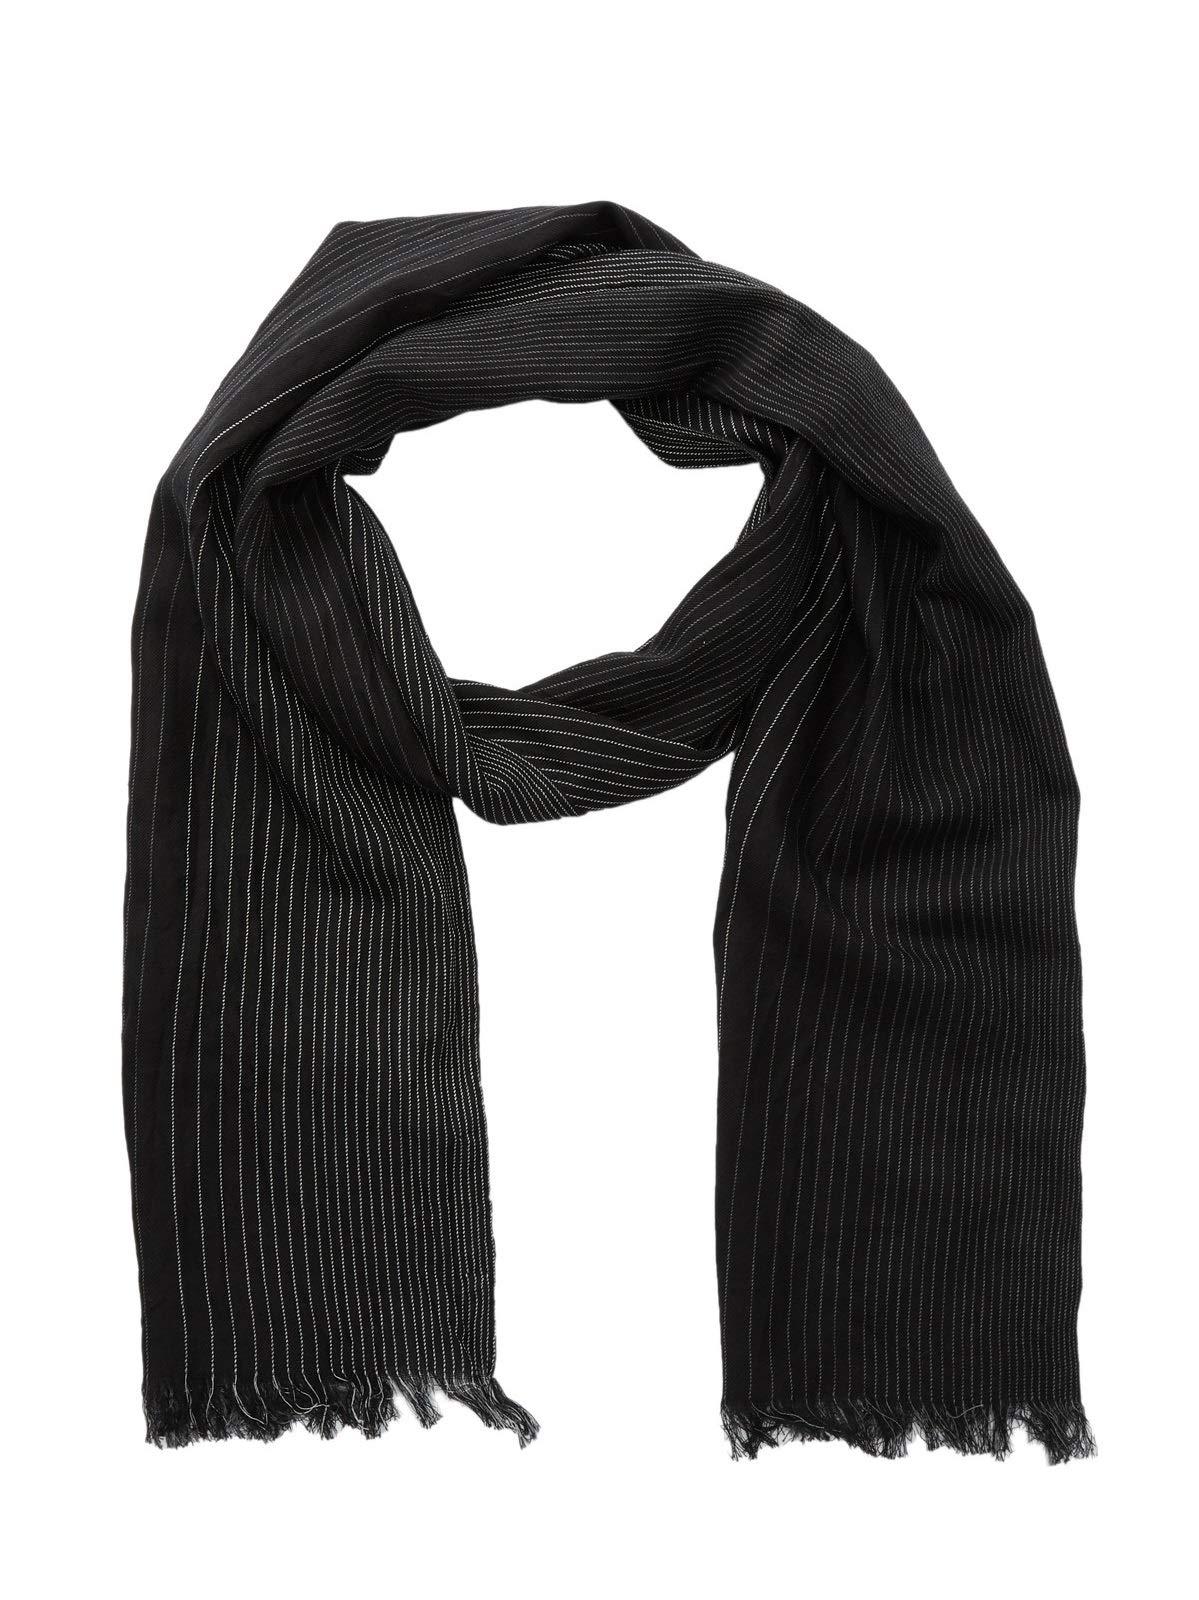 John Varvatos Men's Ombre Pinstripe Silk Fashion Fringe Scarf Black